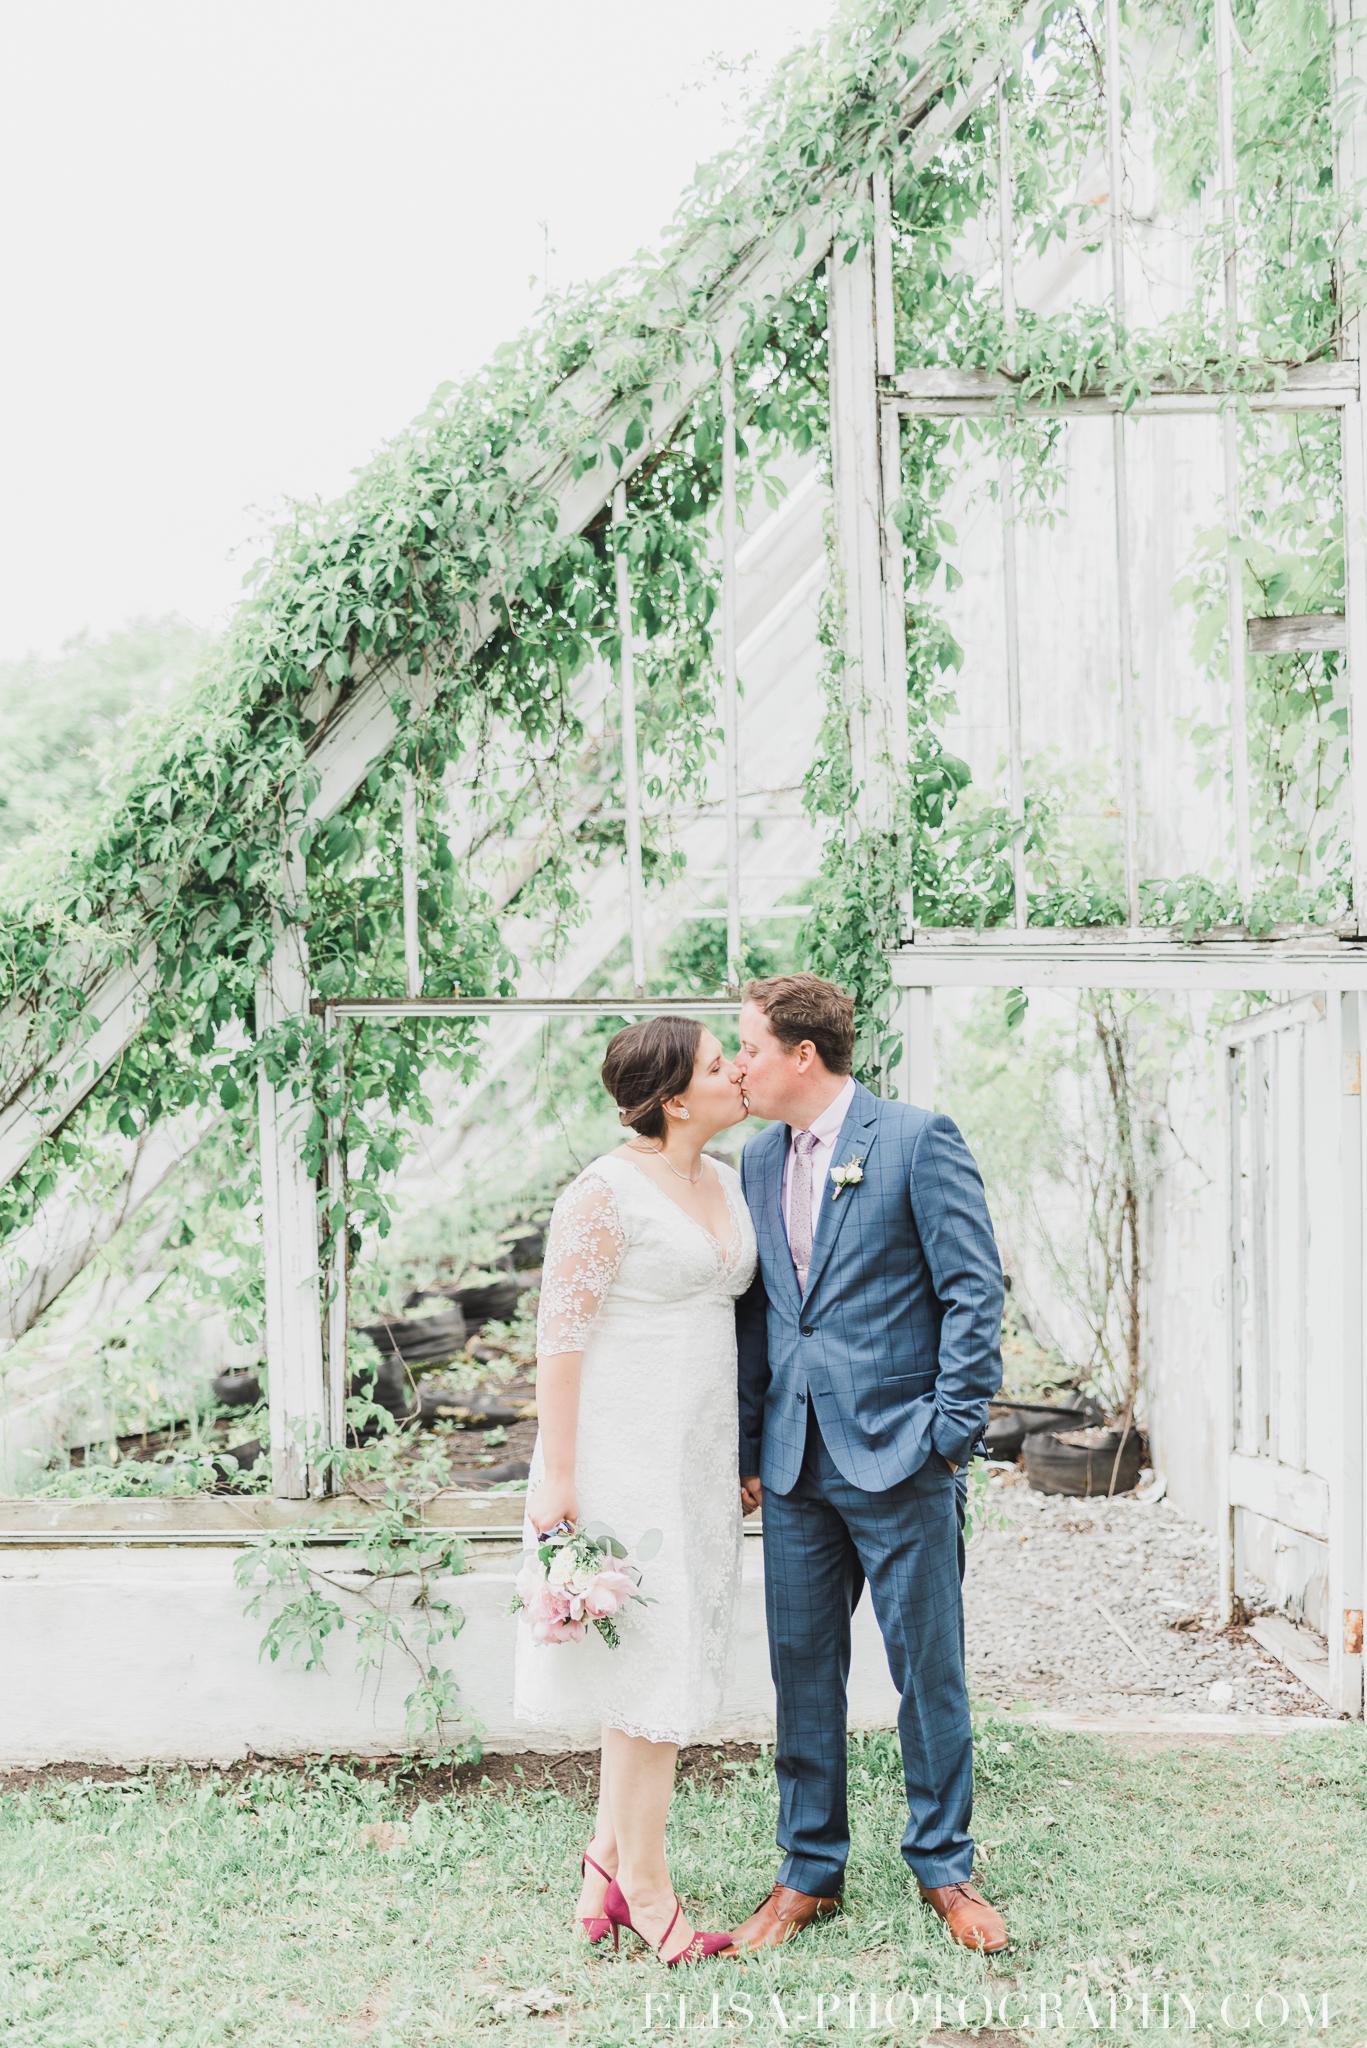 photo mariage domaine cataraqui wedding portrait couple inspiration anglaise jardin ville de quebec 2529 - Mariage d'inspiration anglaise au domaine Cataraqui